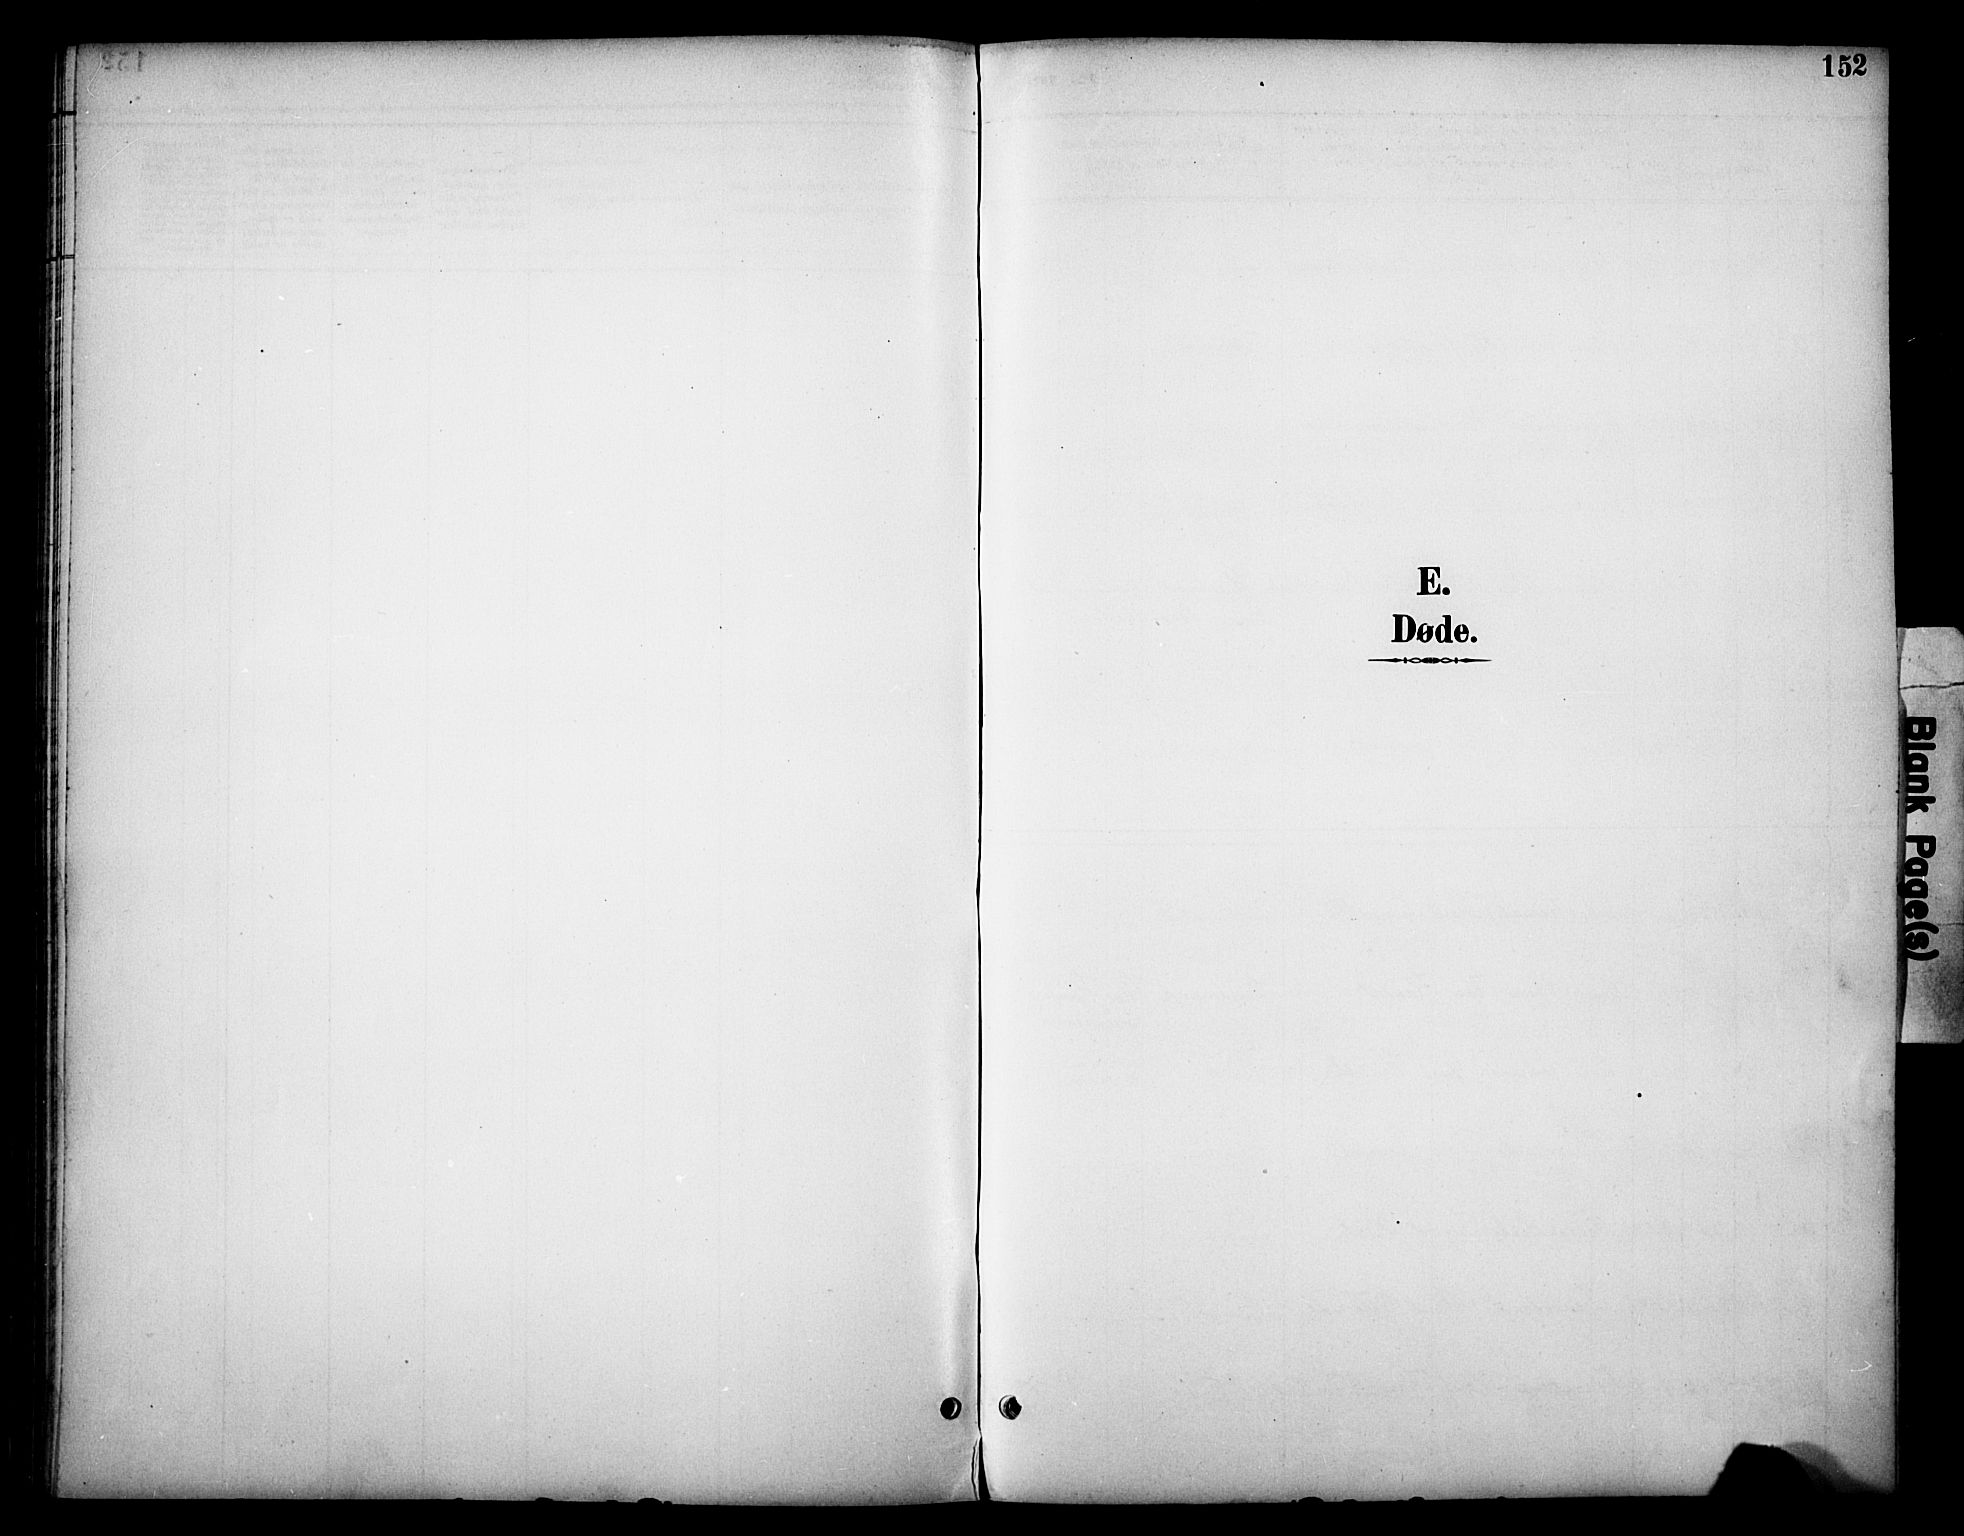 SAH, Dovre prestekontor, Ministerialbok nr. 3, 1891-1901, s. 152